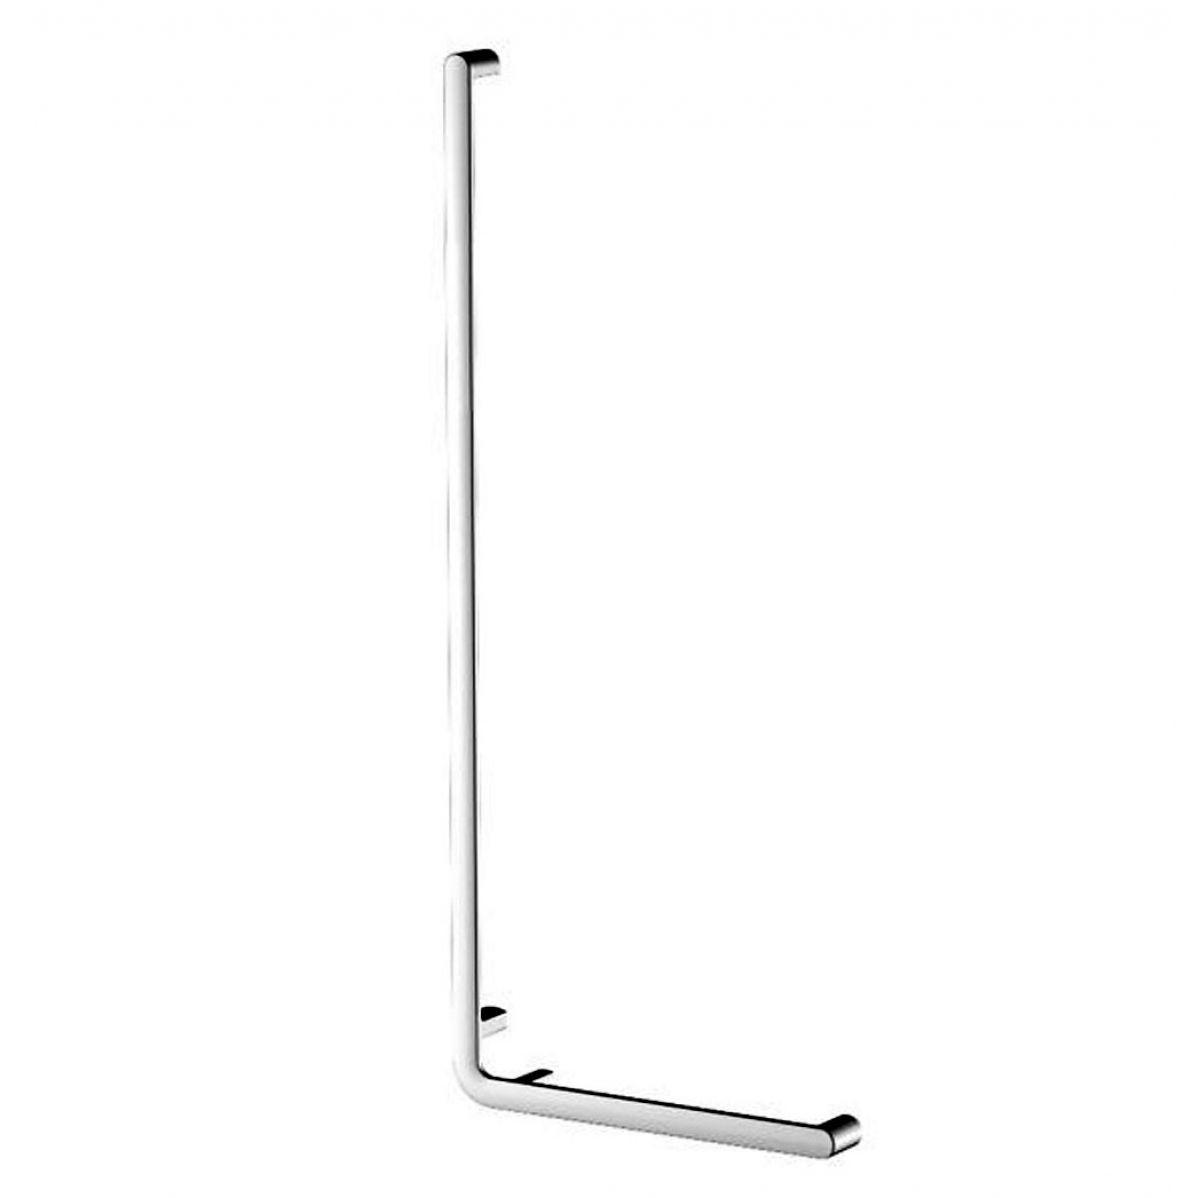 Keuco Elegance Angled Grab Bar 90° : UK Bathrooms